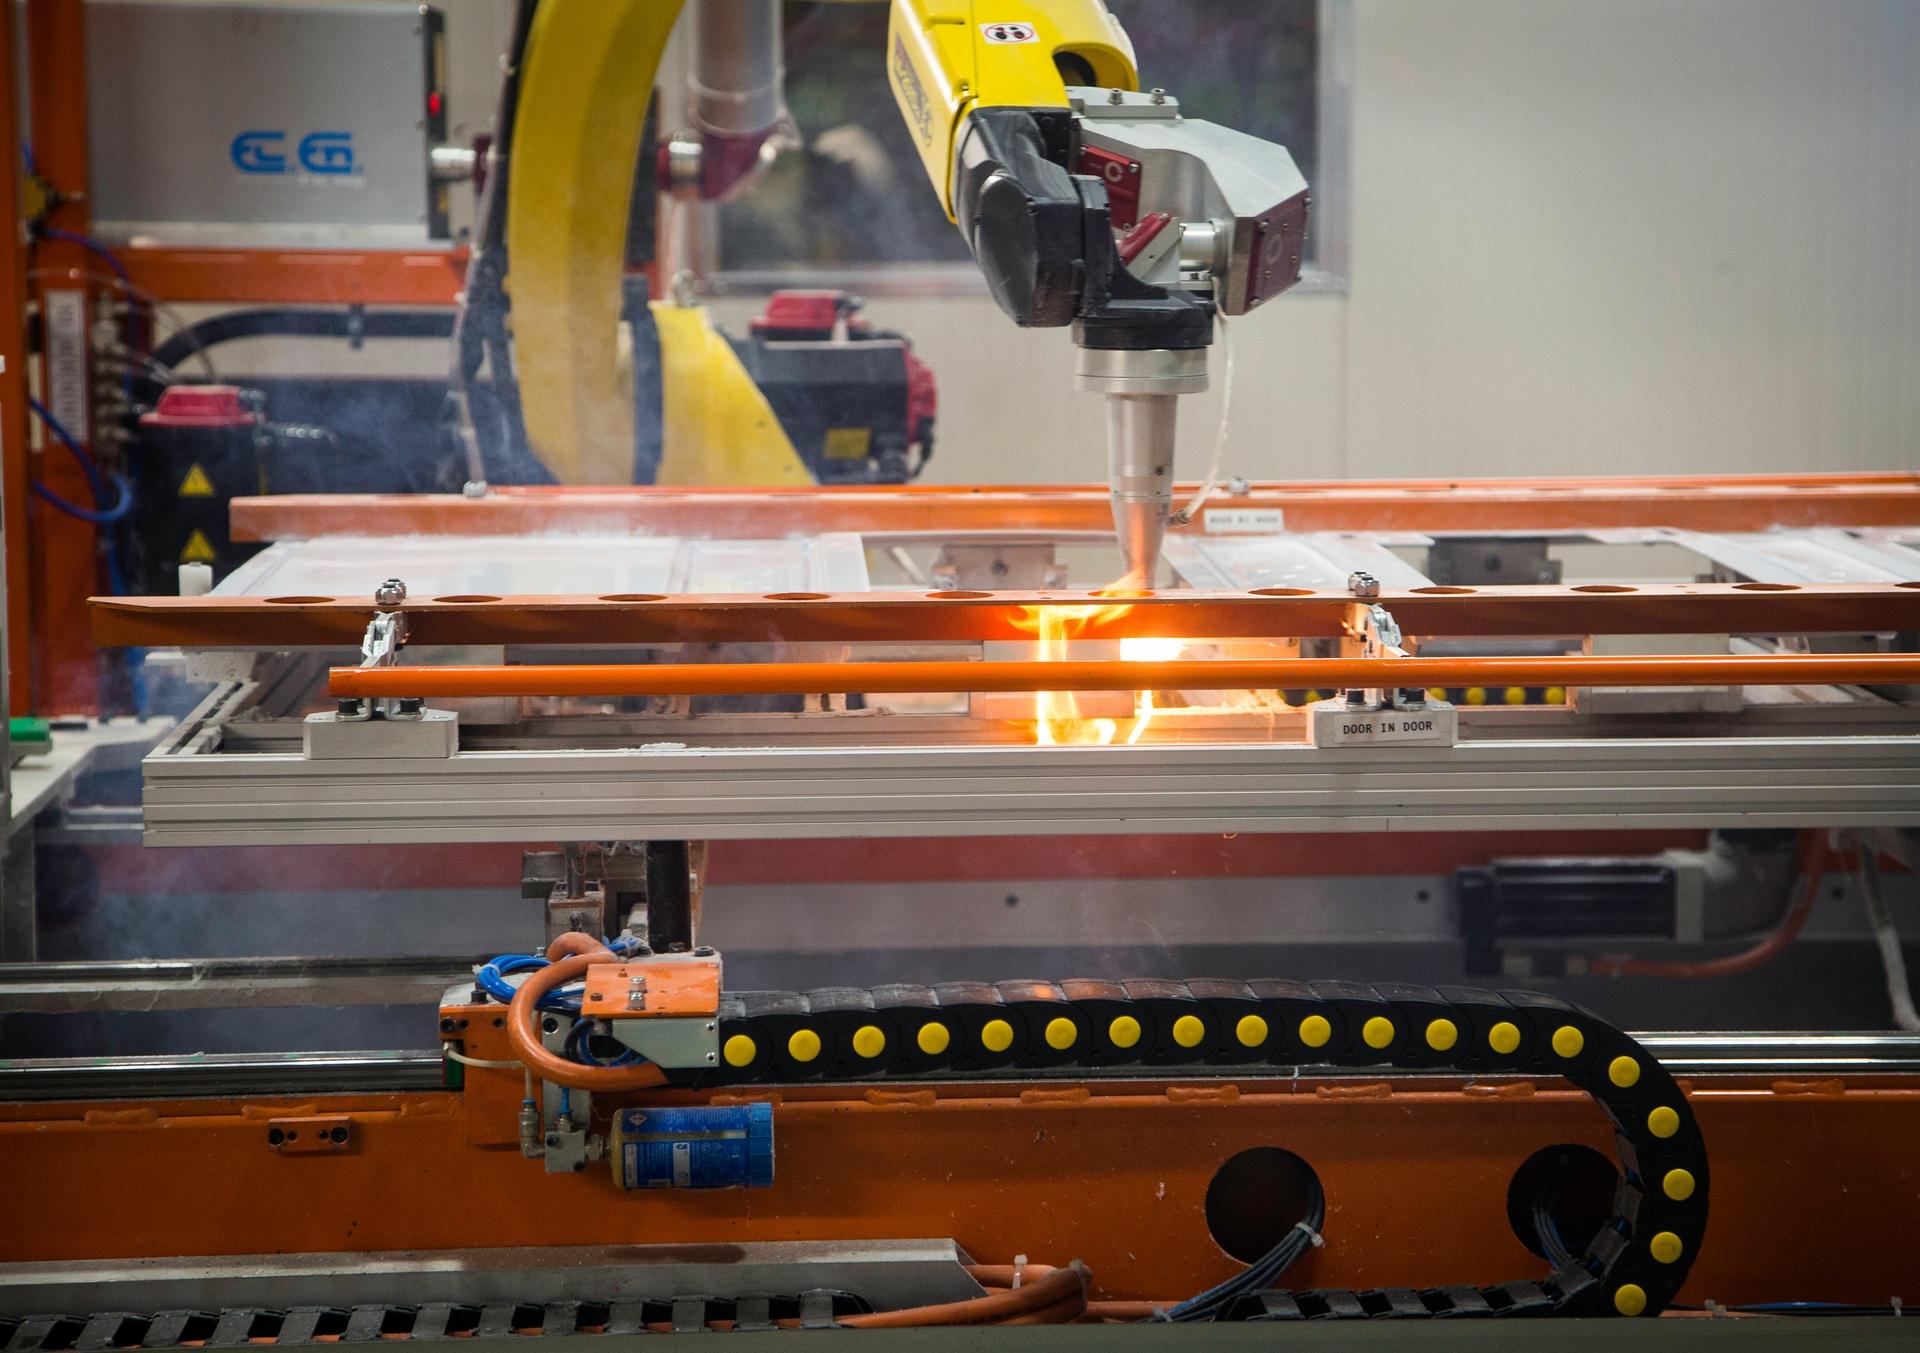 Laser pierce robots cutting holes